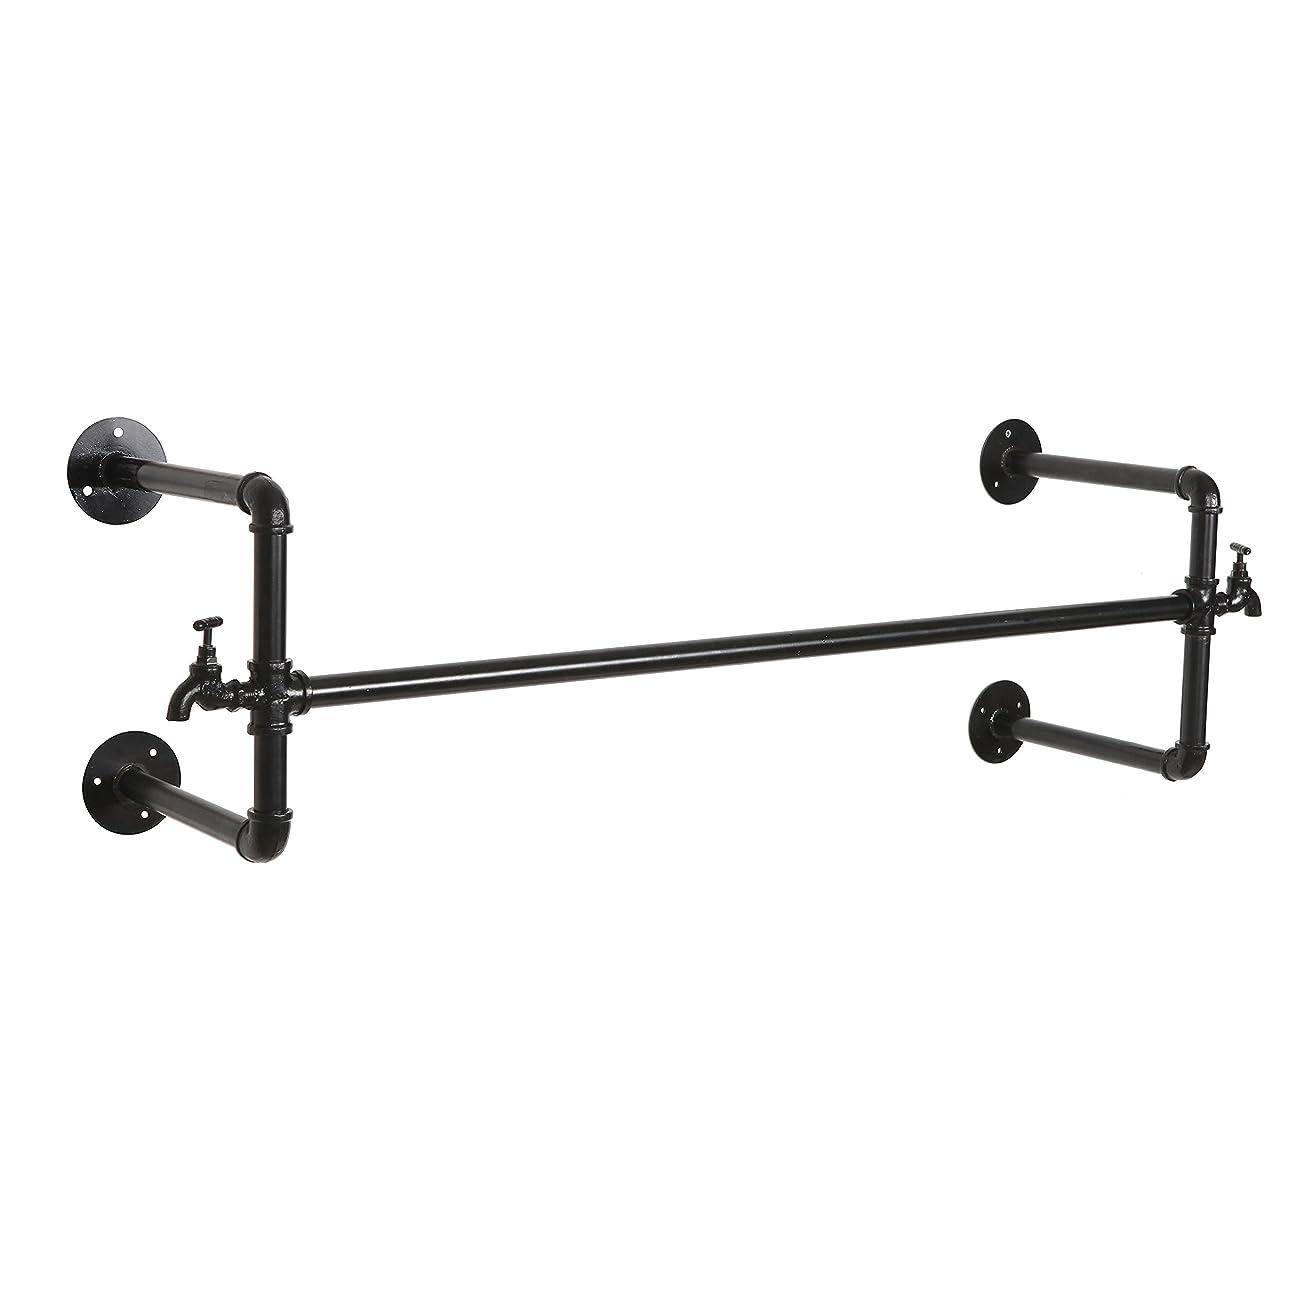 Black Metal Wall Mounted Faucet Design Closet Rod Garment